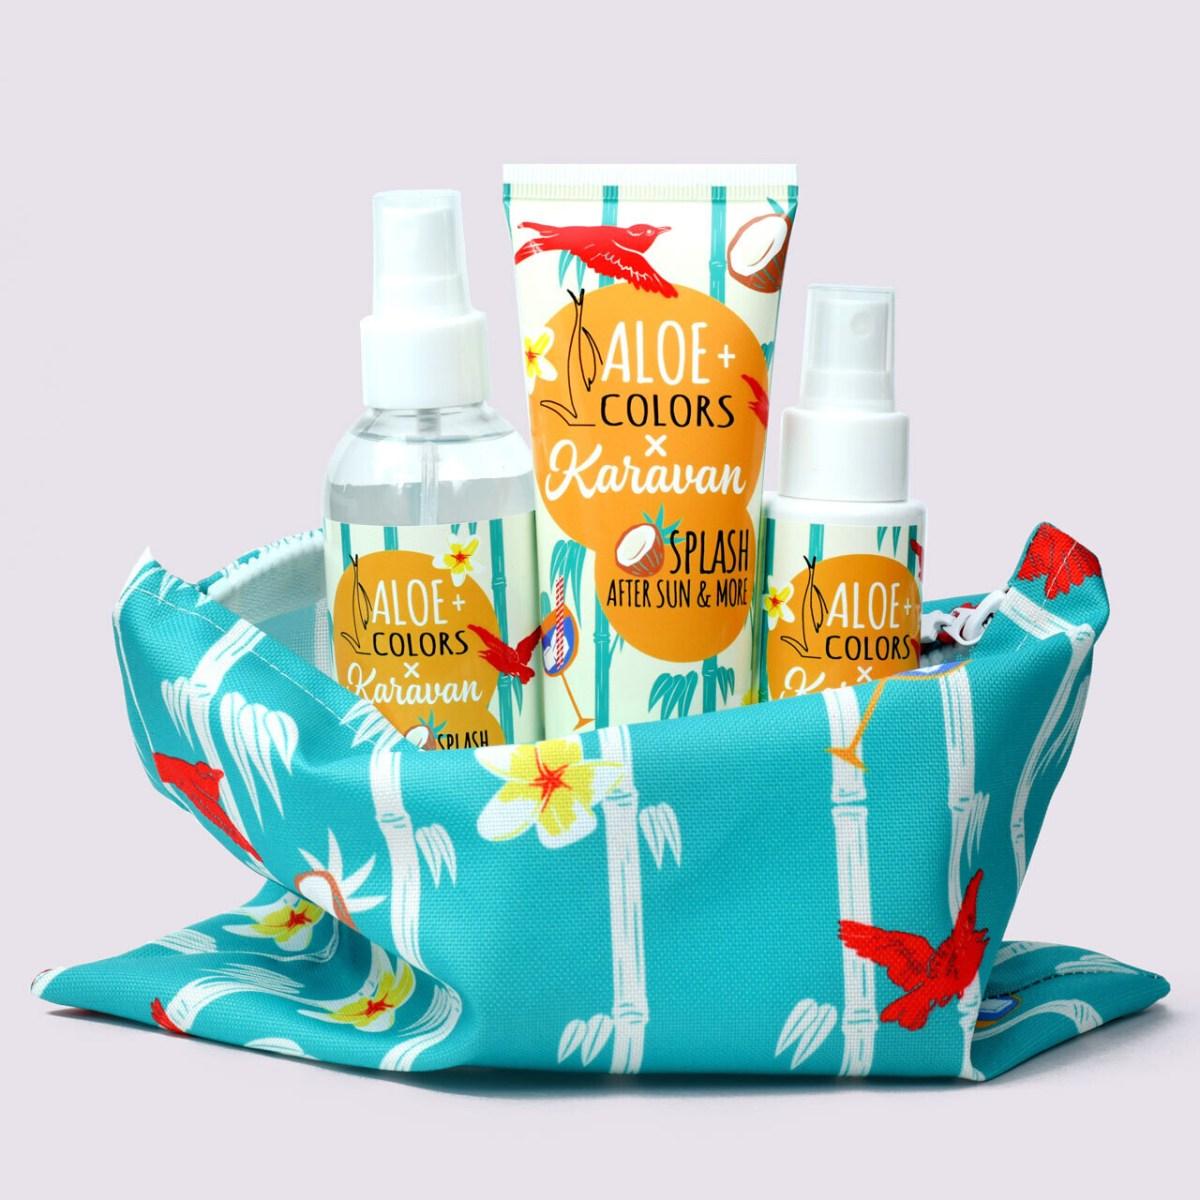 Aloe+Colors x karavan splash summer bag